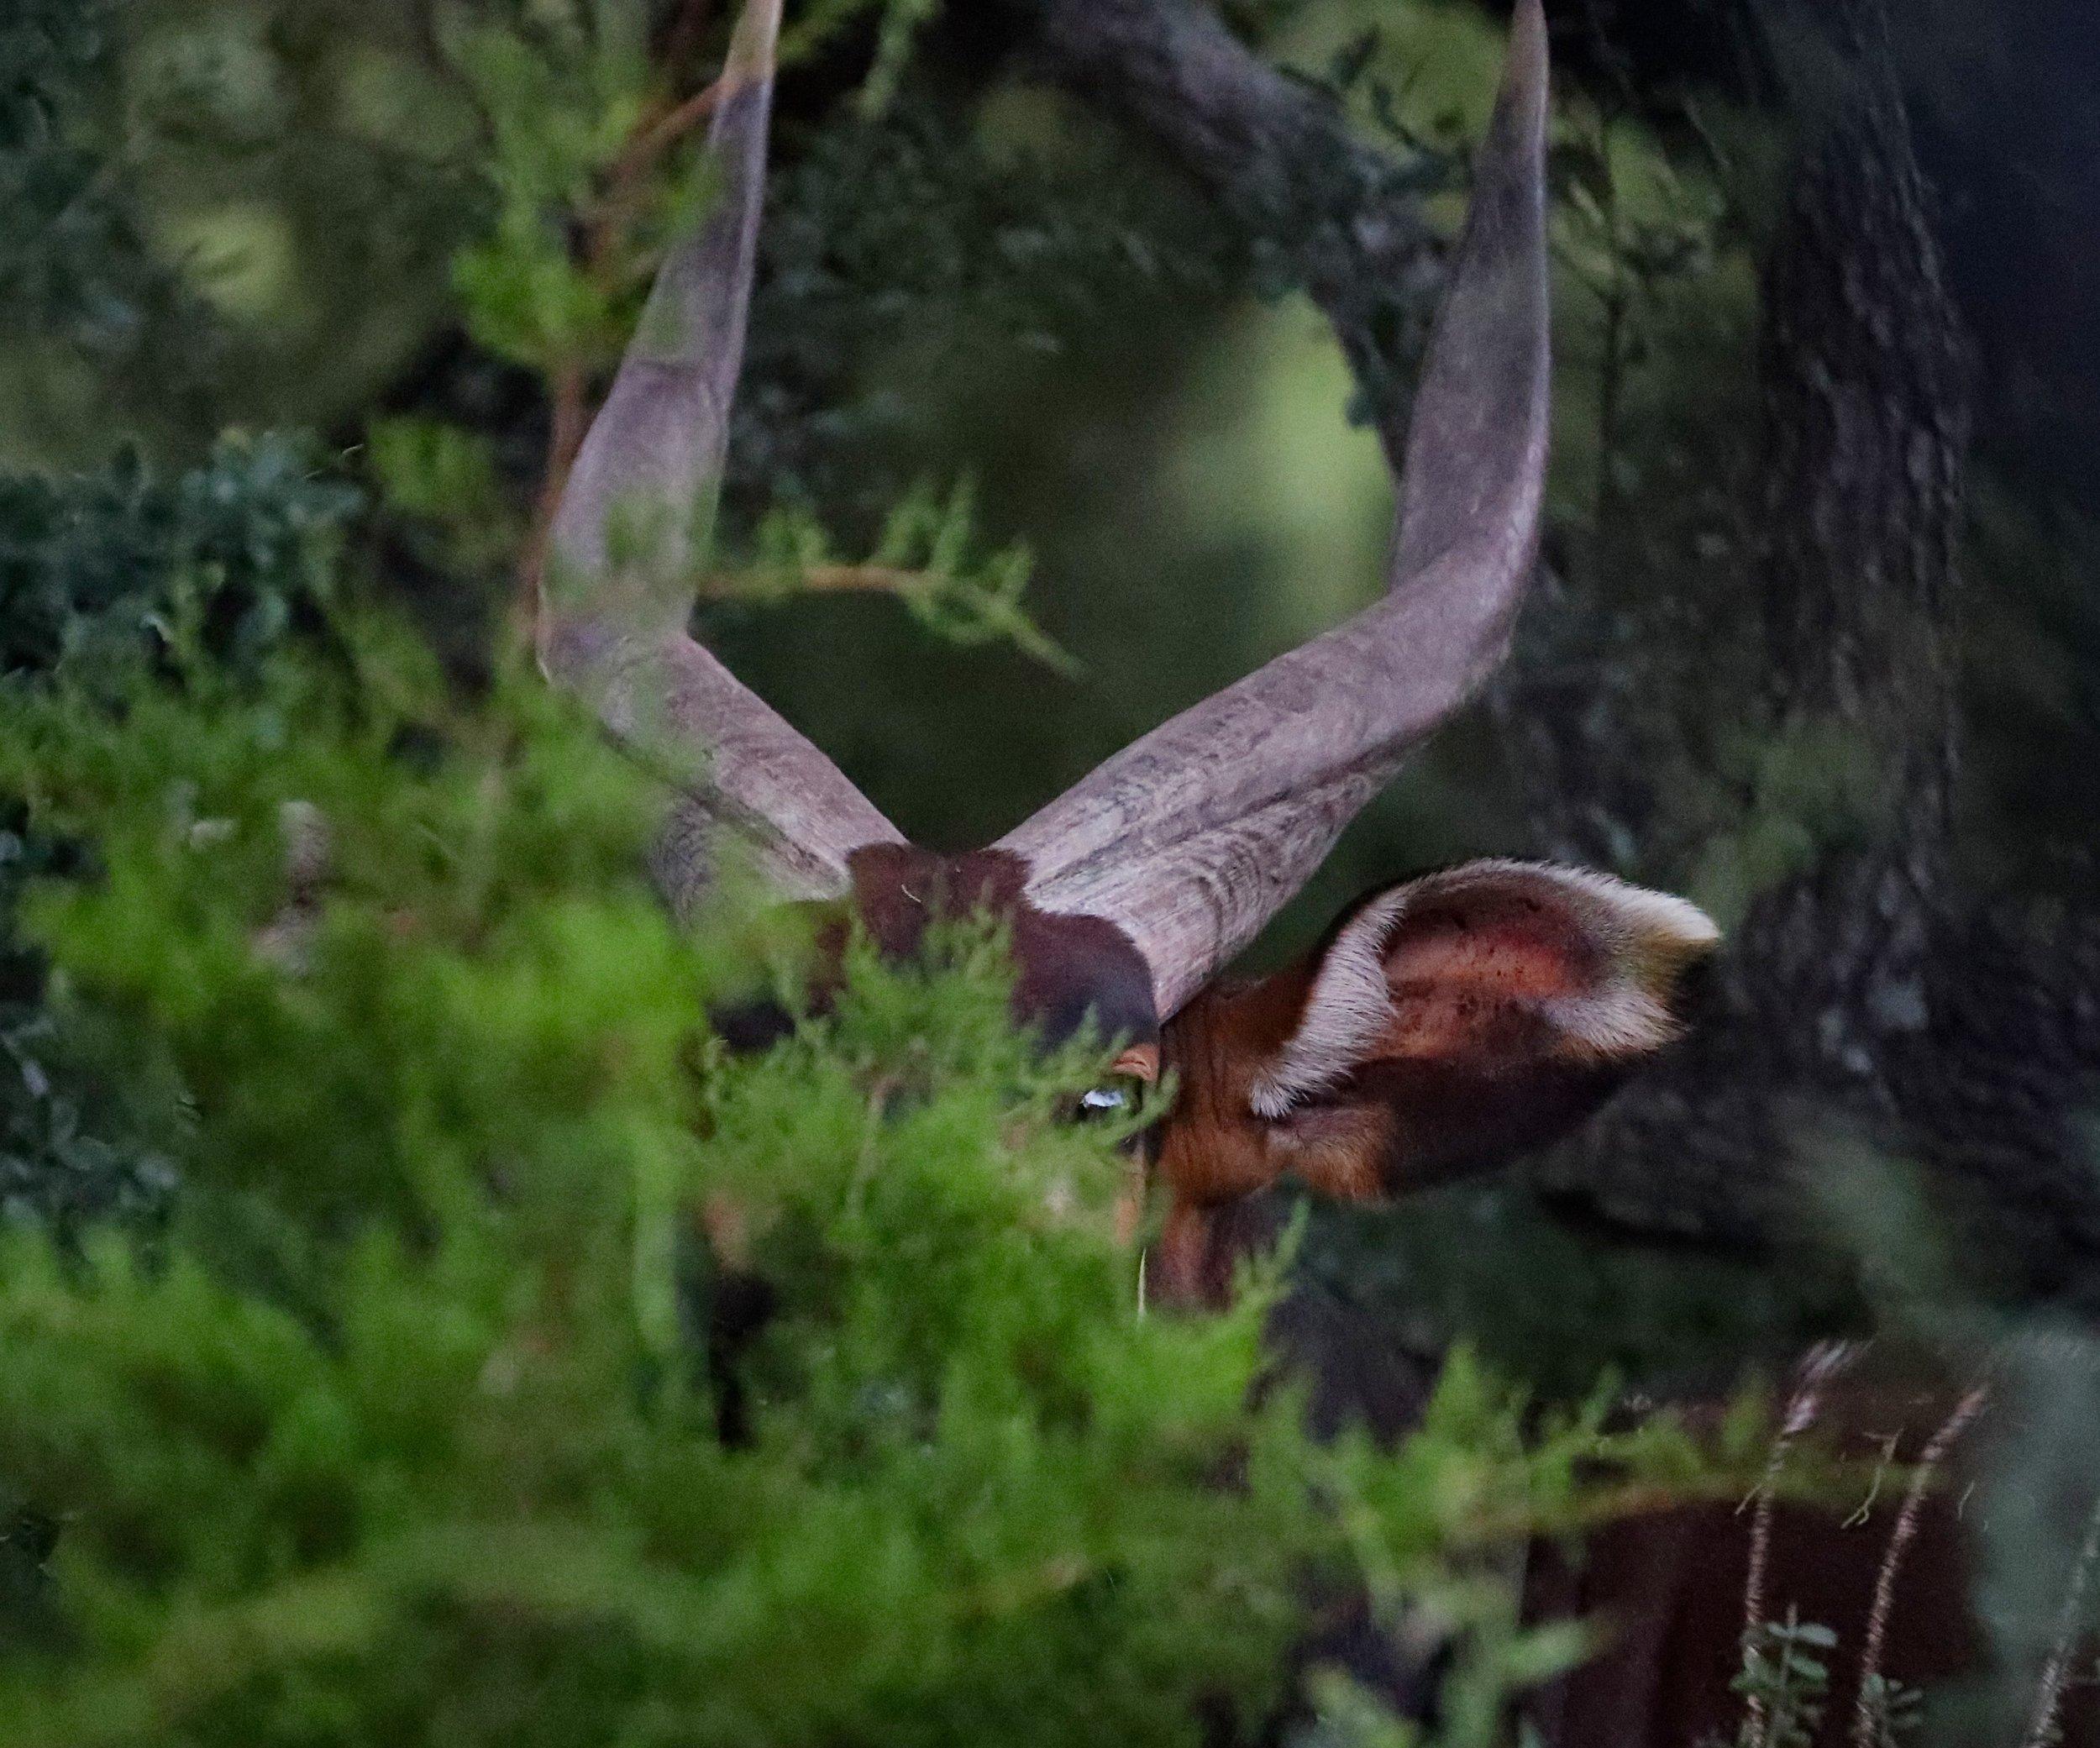 Male Mountain Bongo Hiding In Brush